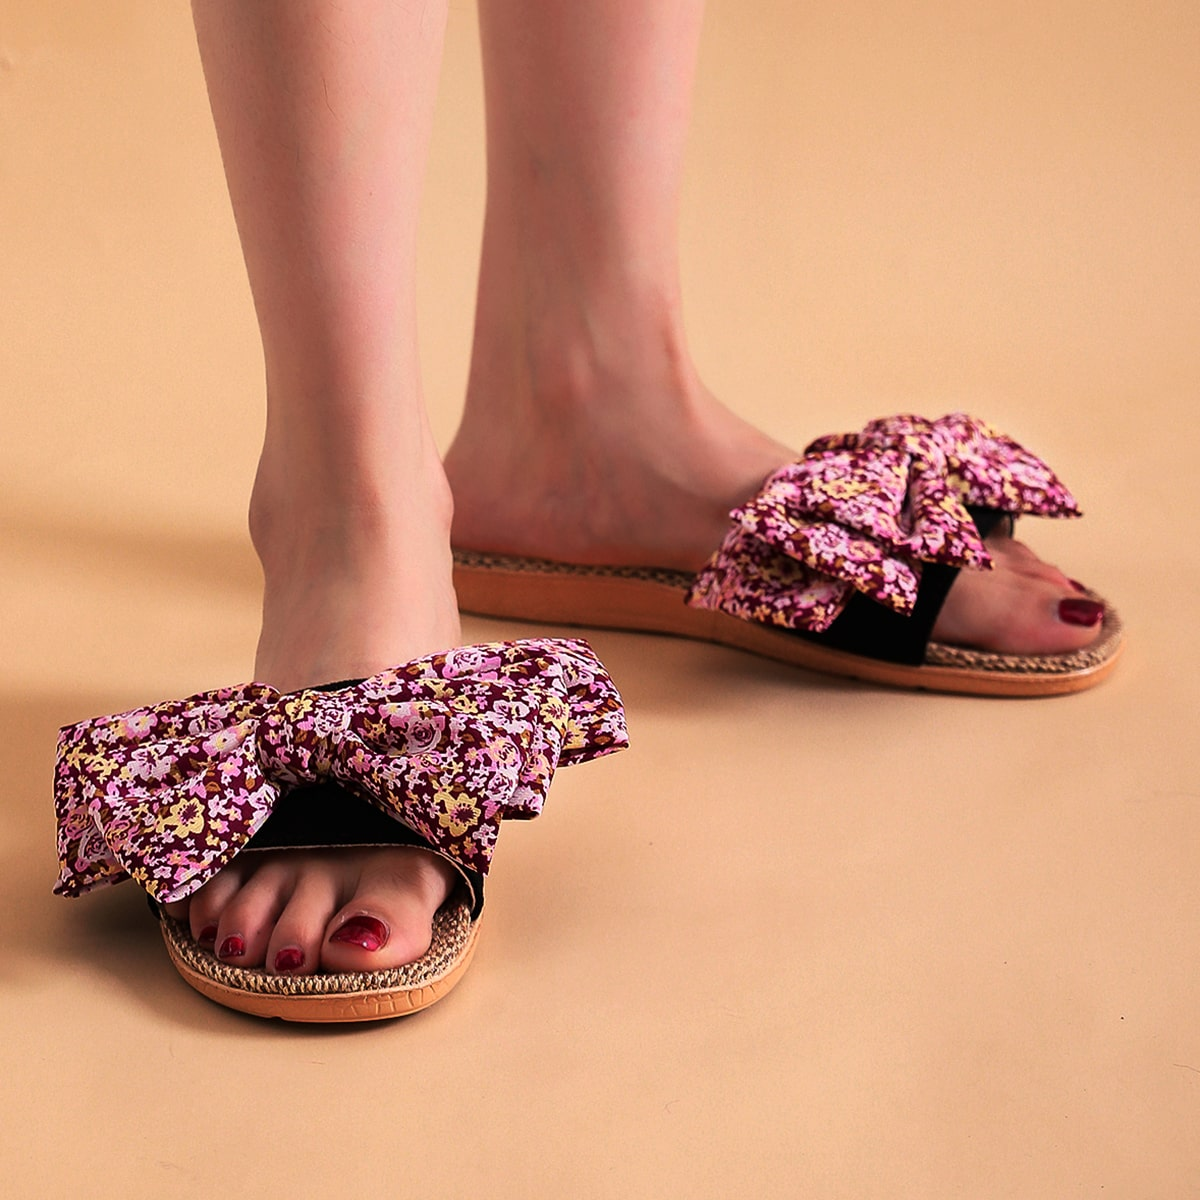 SHEIN Pantoffels met bloemen grafisch versierde strik